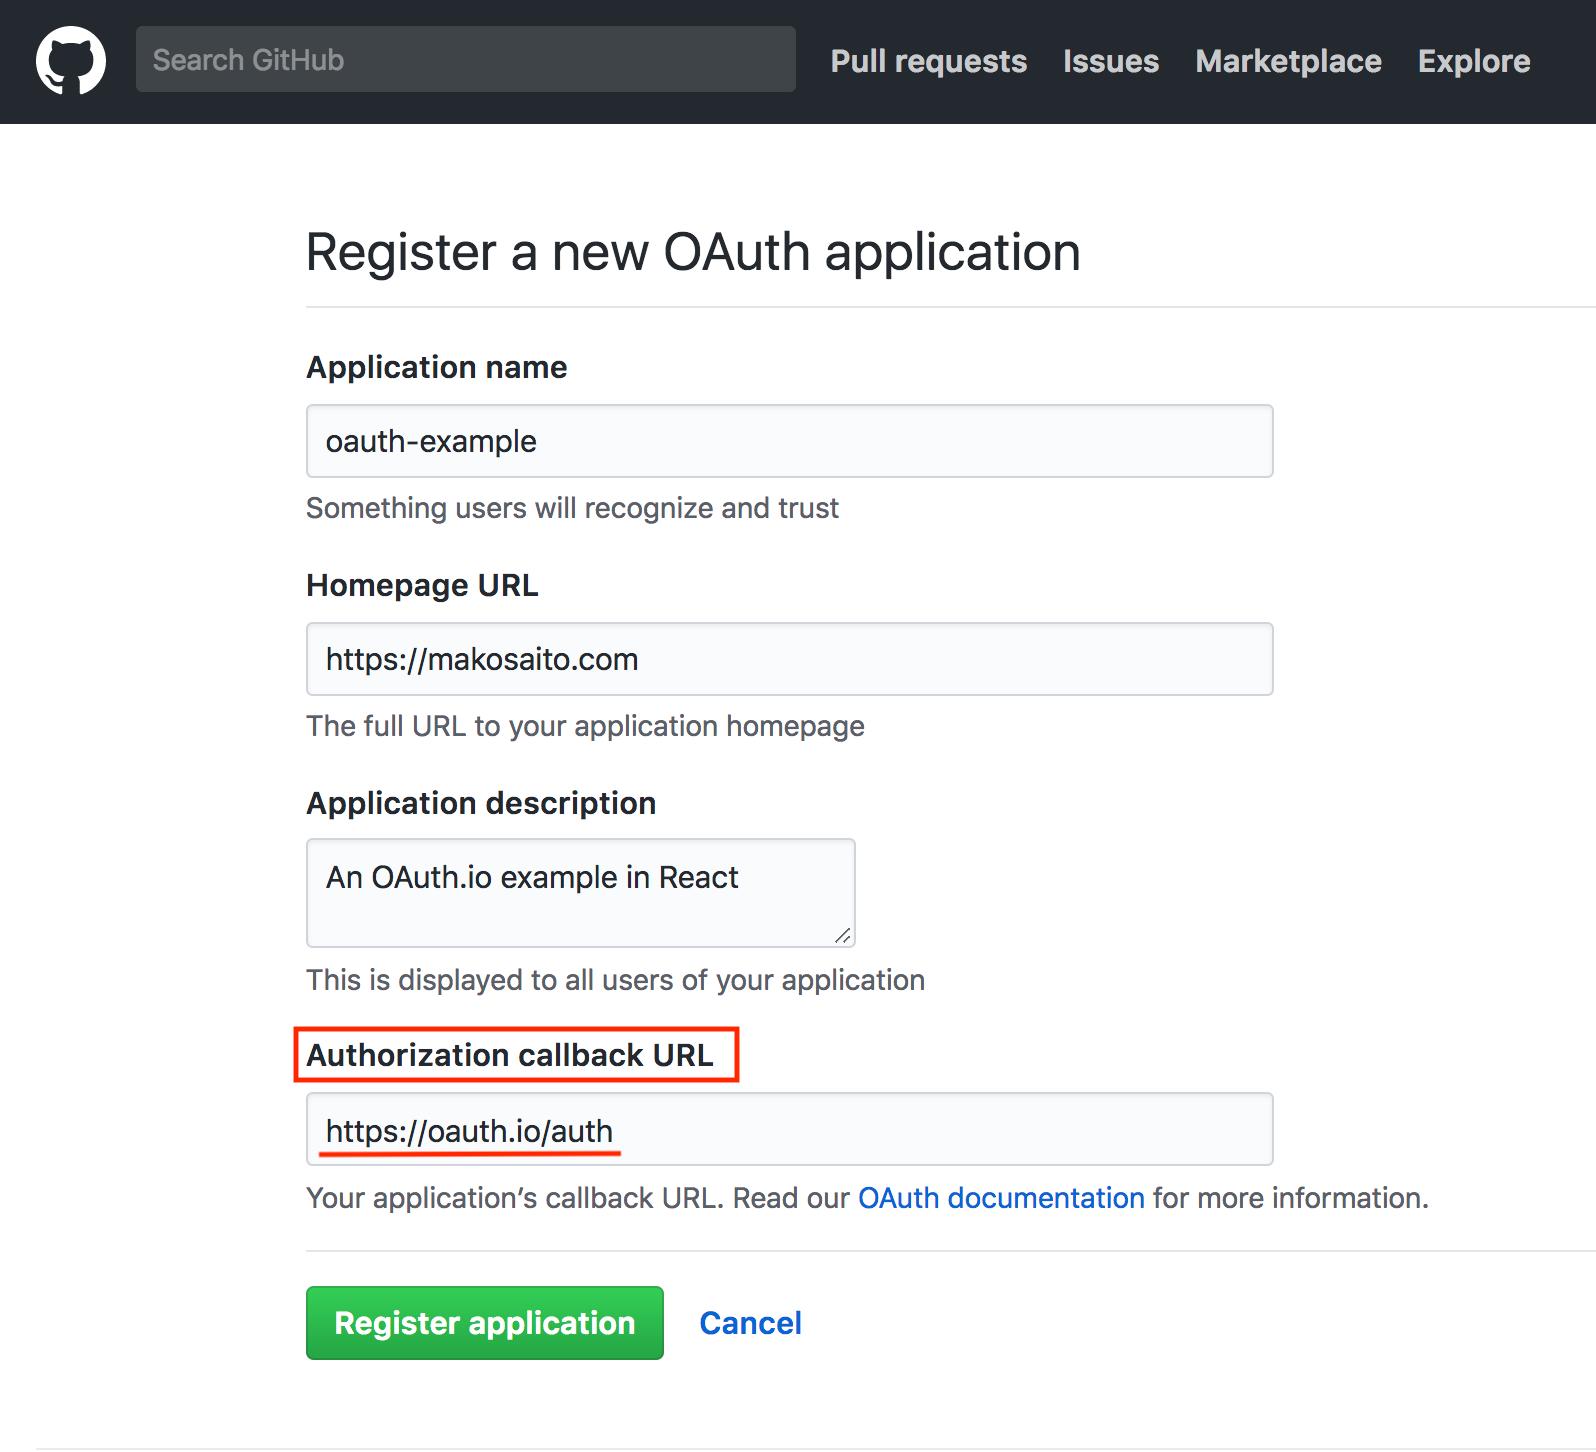 OAuth認証 + React jsを使ってソーシャルログインボタンを導入